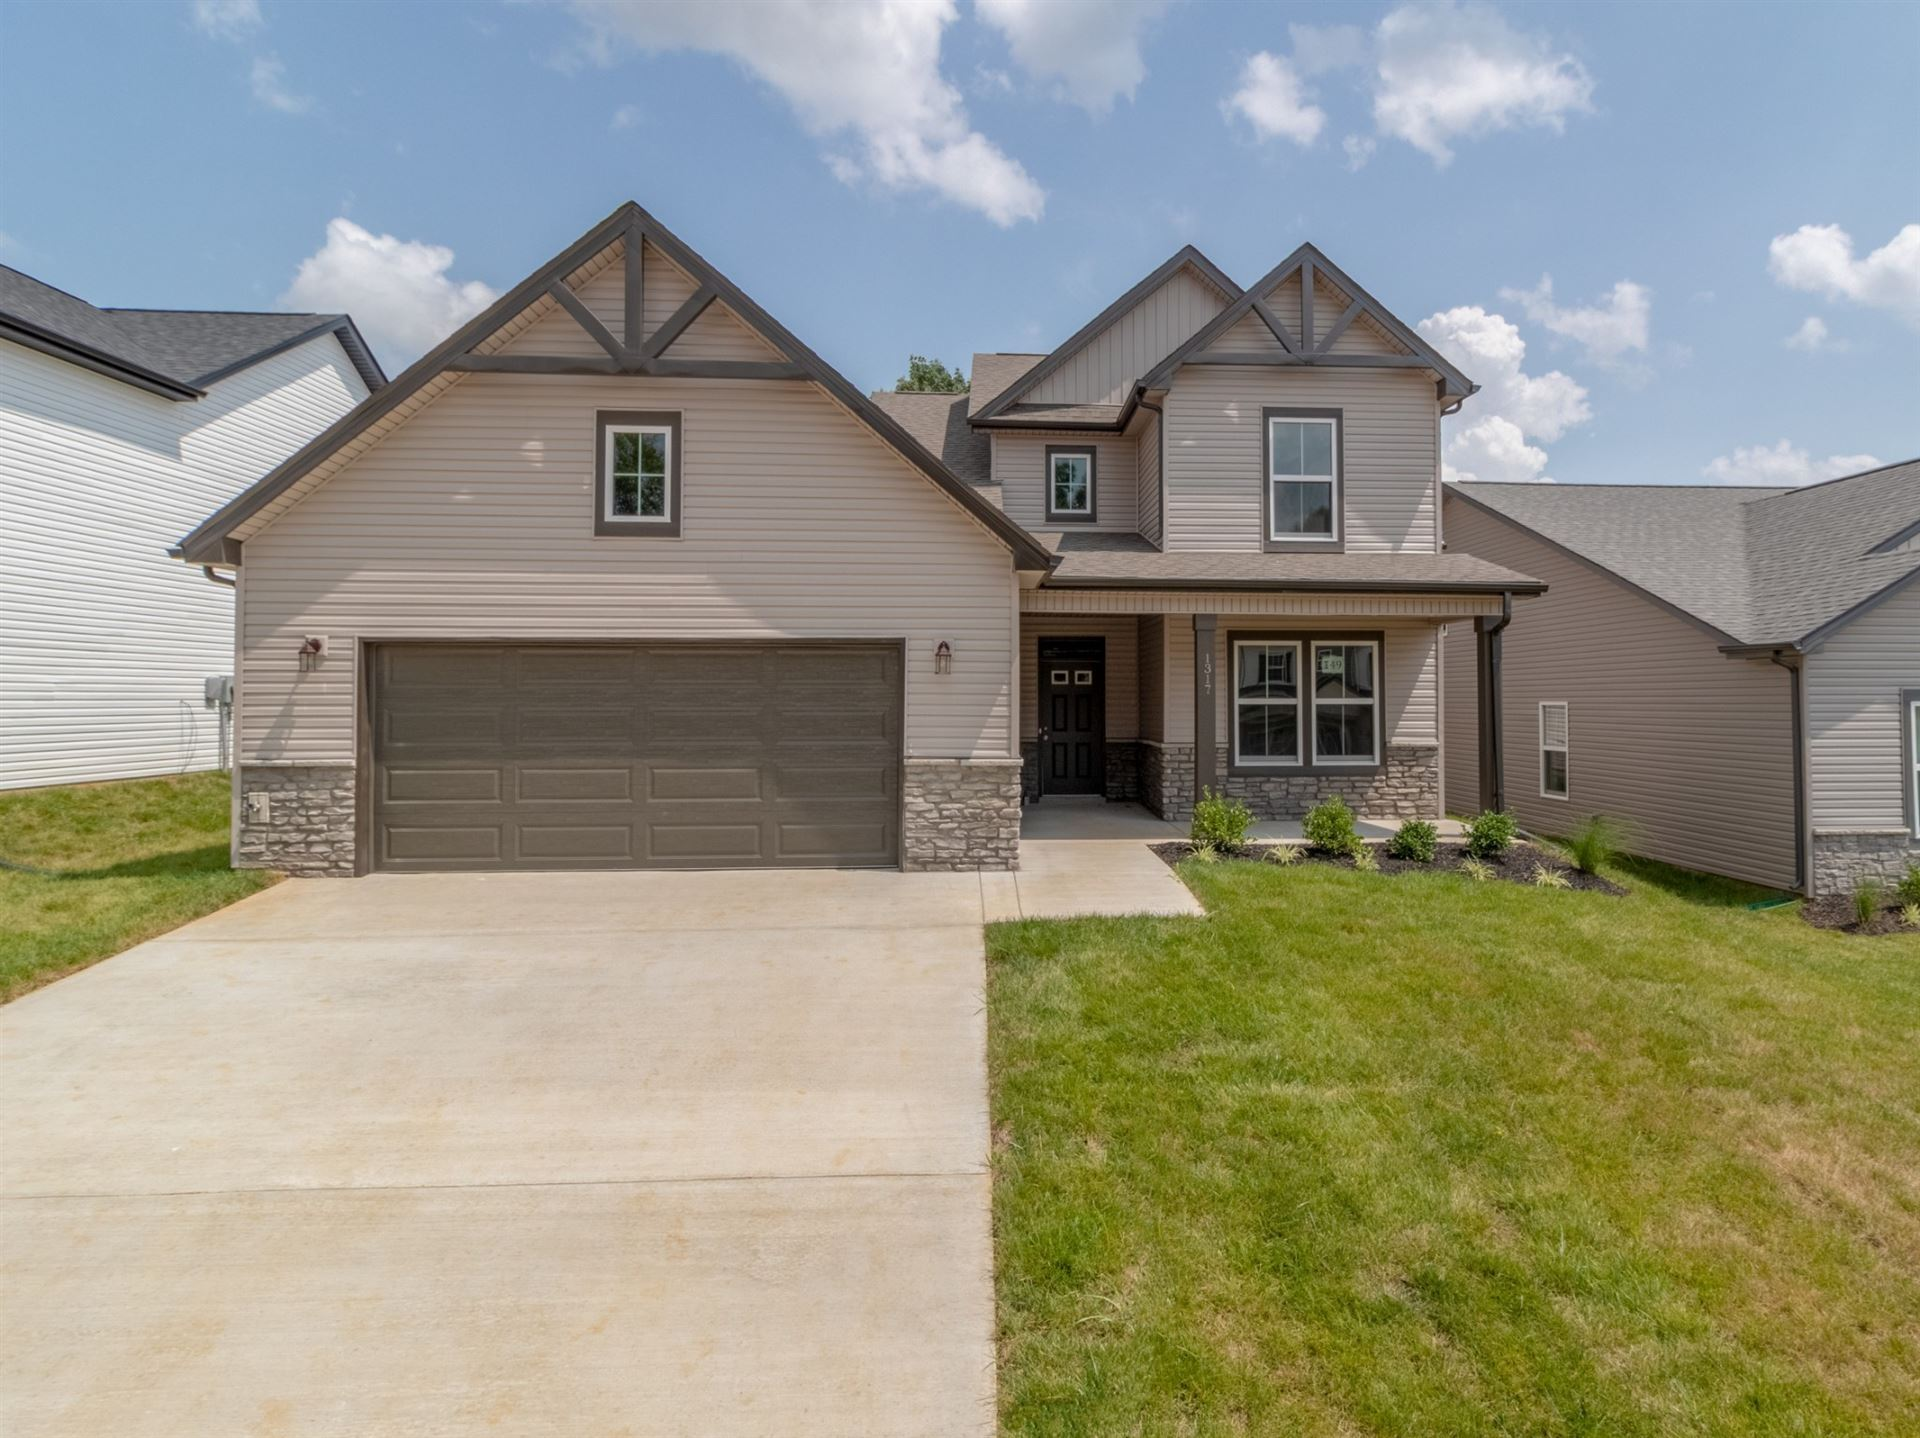 219 Mills Creek, Clarksville, TN 37042 - MLS#: 2298981